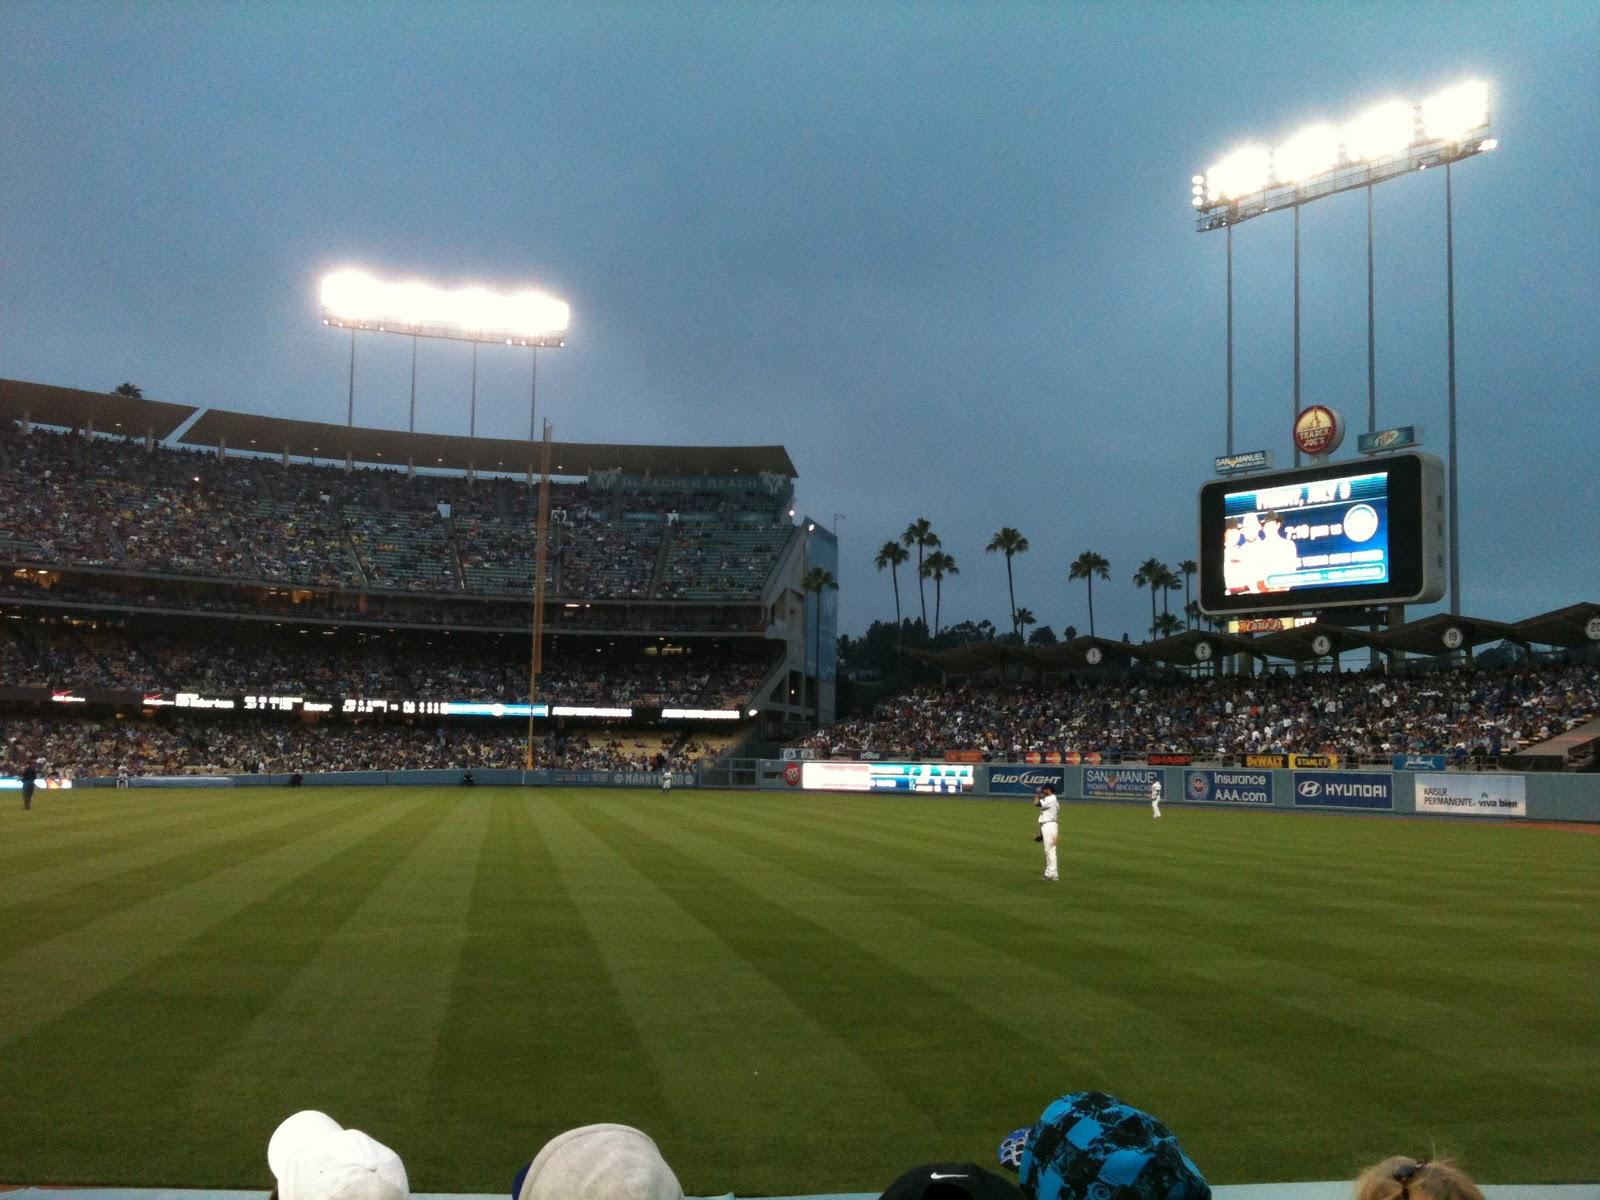 MLB Ballpark Project: Dodger Stadium (Los Angeles Dodgers)